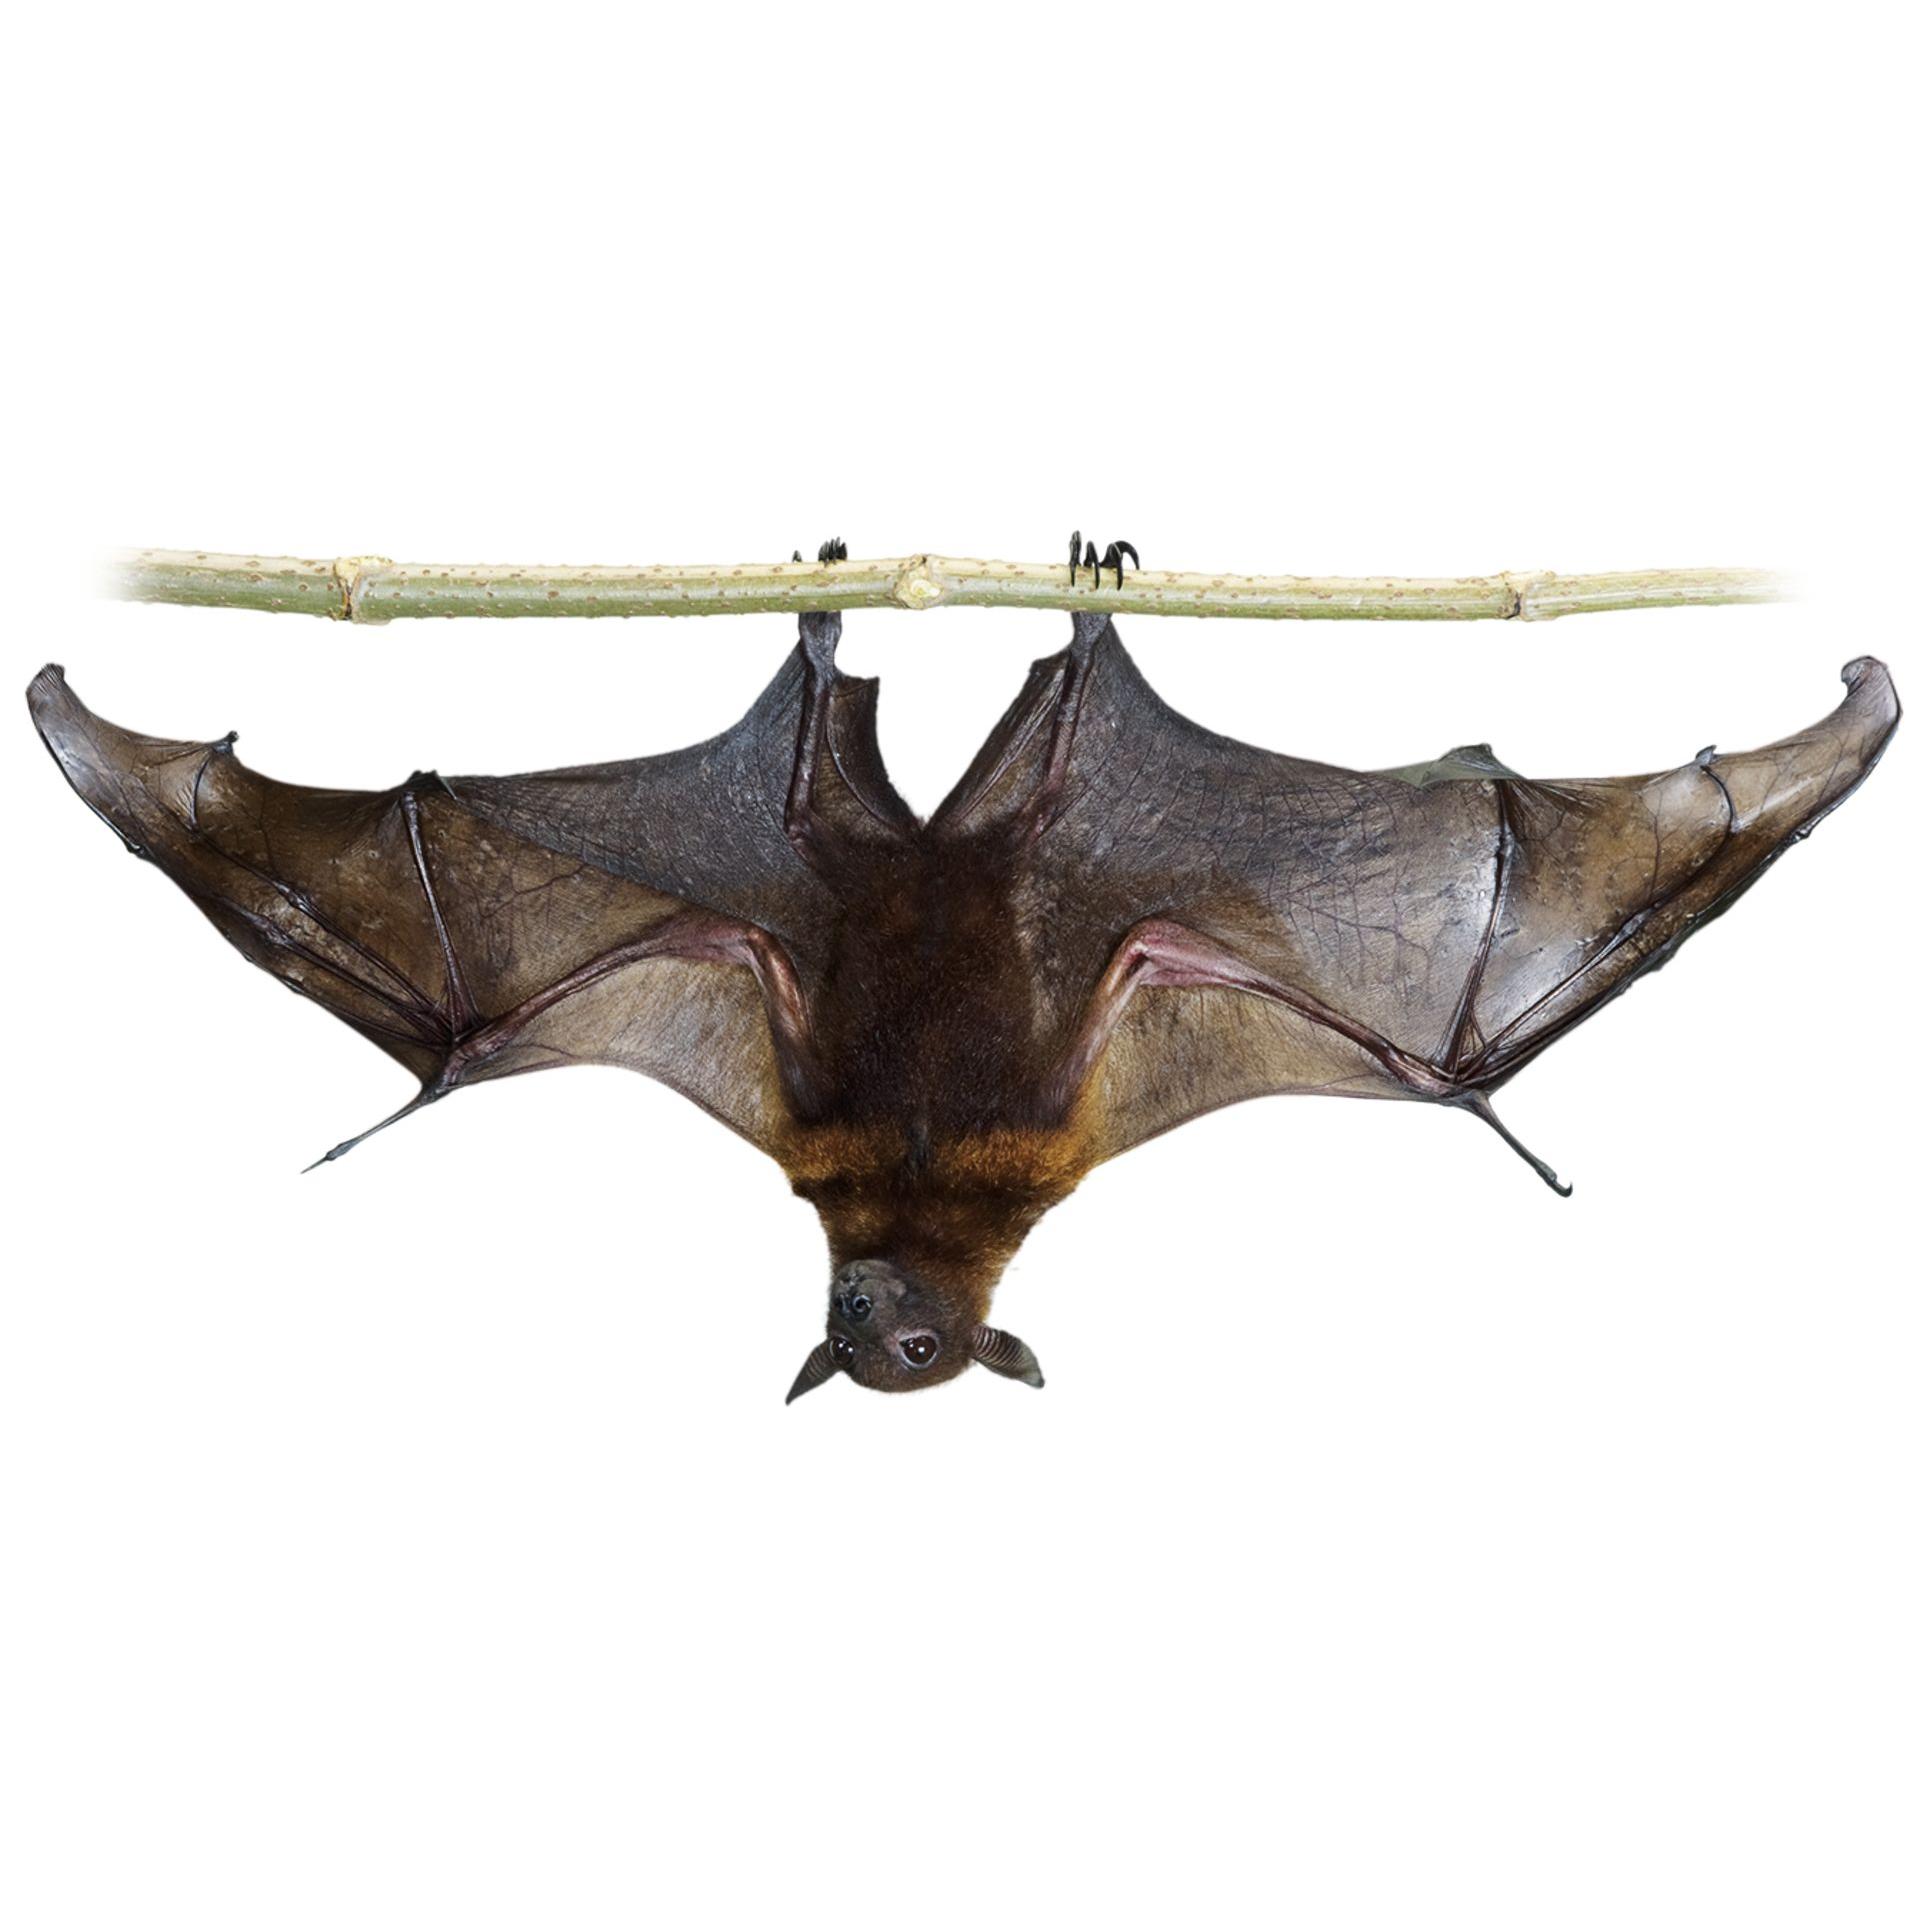 What is a Bat